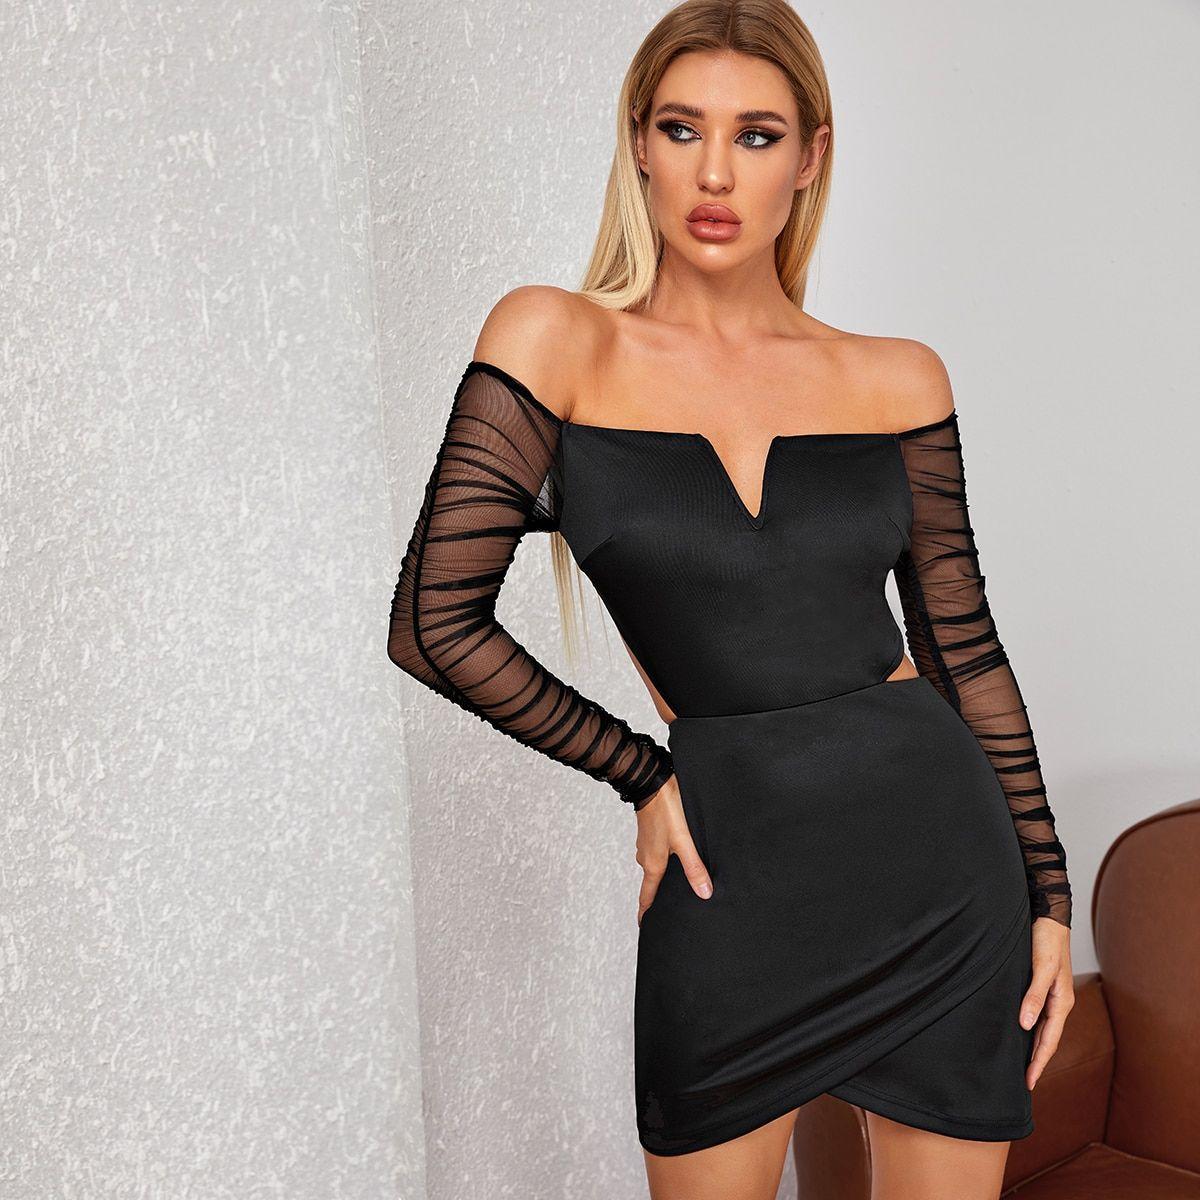 Notched Neck Mesh Sleeve Cutout Wrap Dress Mesh Sleeves Wrap Dress Glamorous Dresses [ 1200 x 1200 Pixel ]